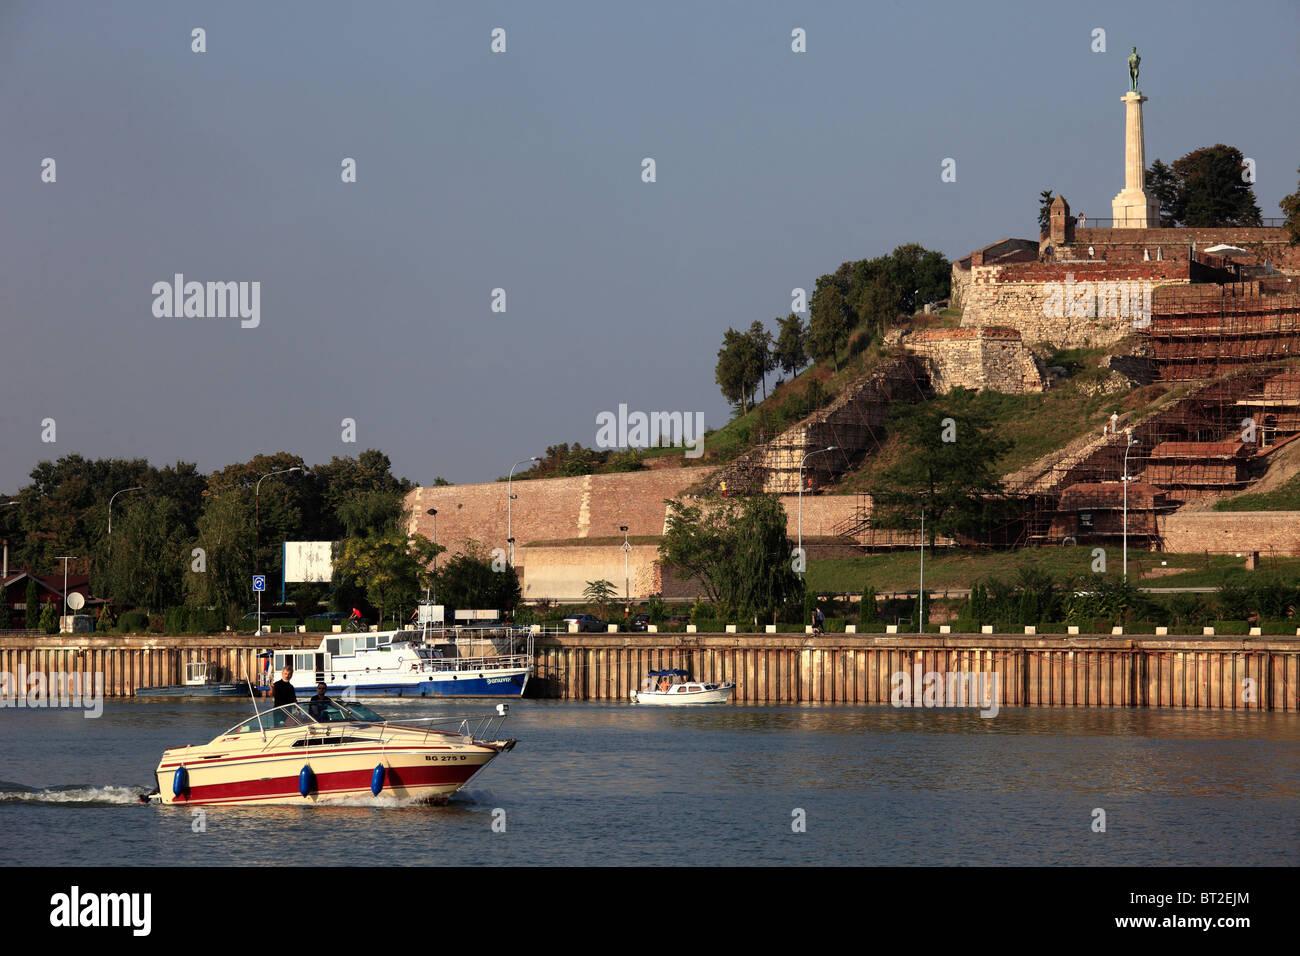 Serbia, Belgrade, Kalemegdan Citadel, Sava River, boats, - Stock Image